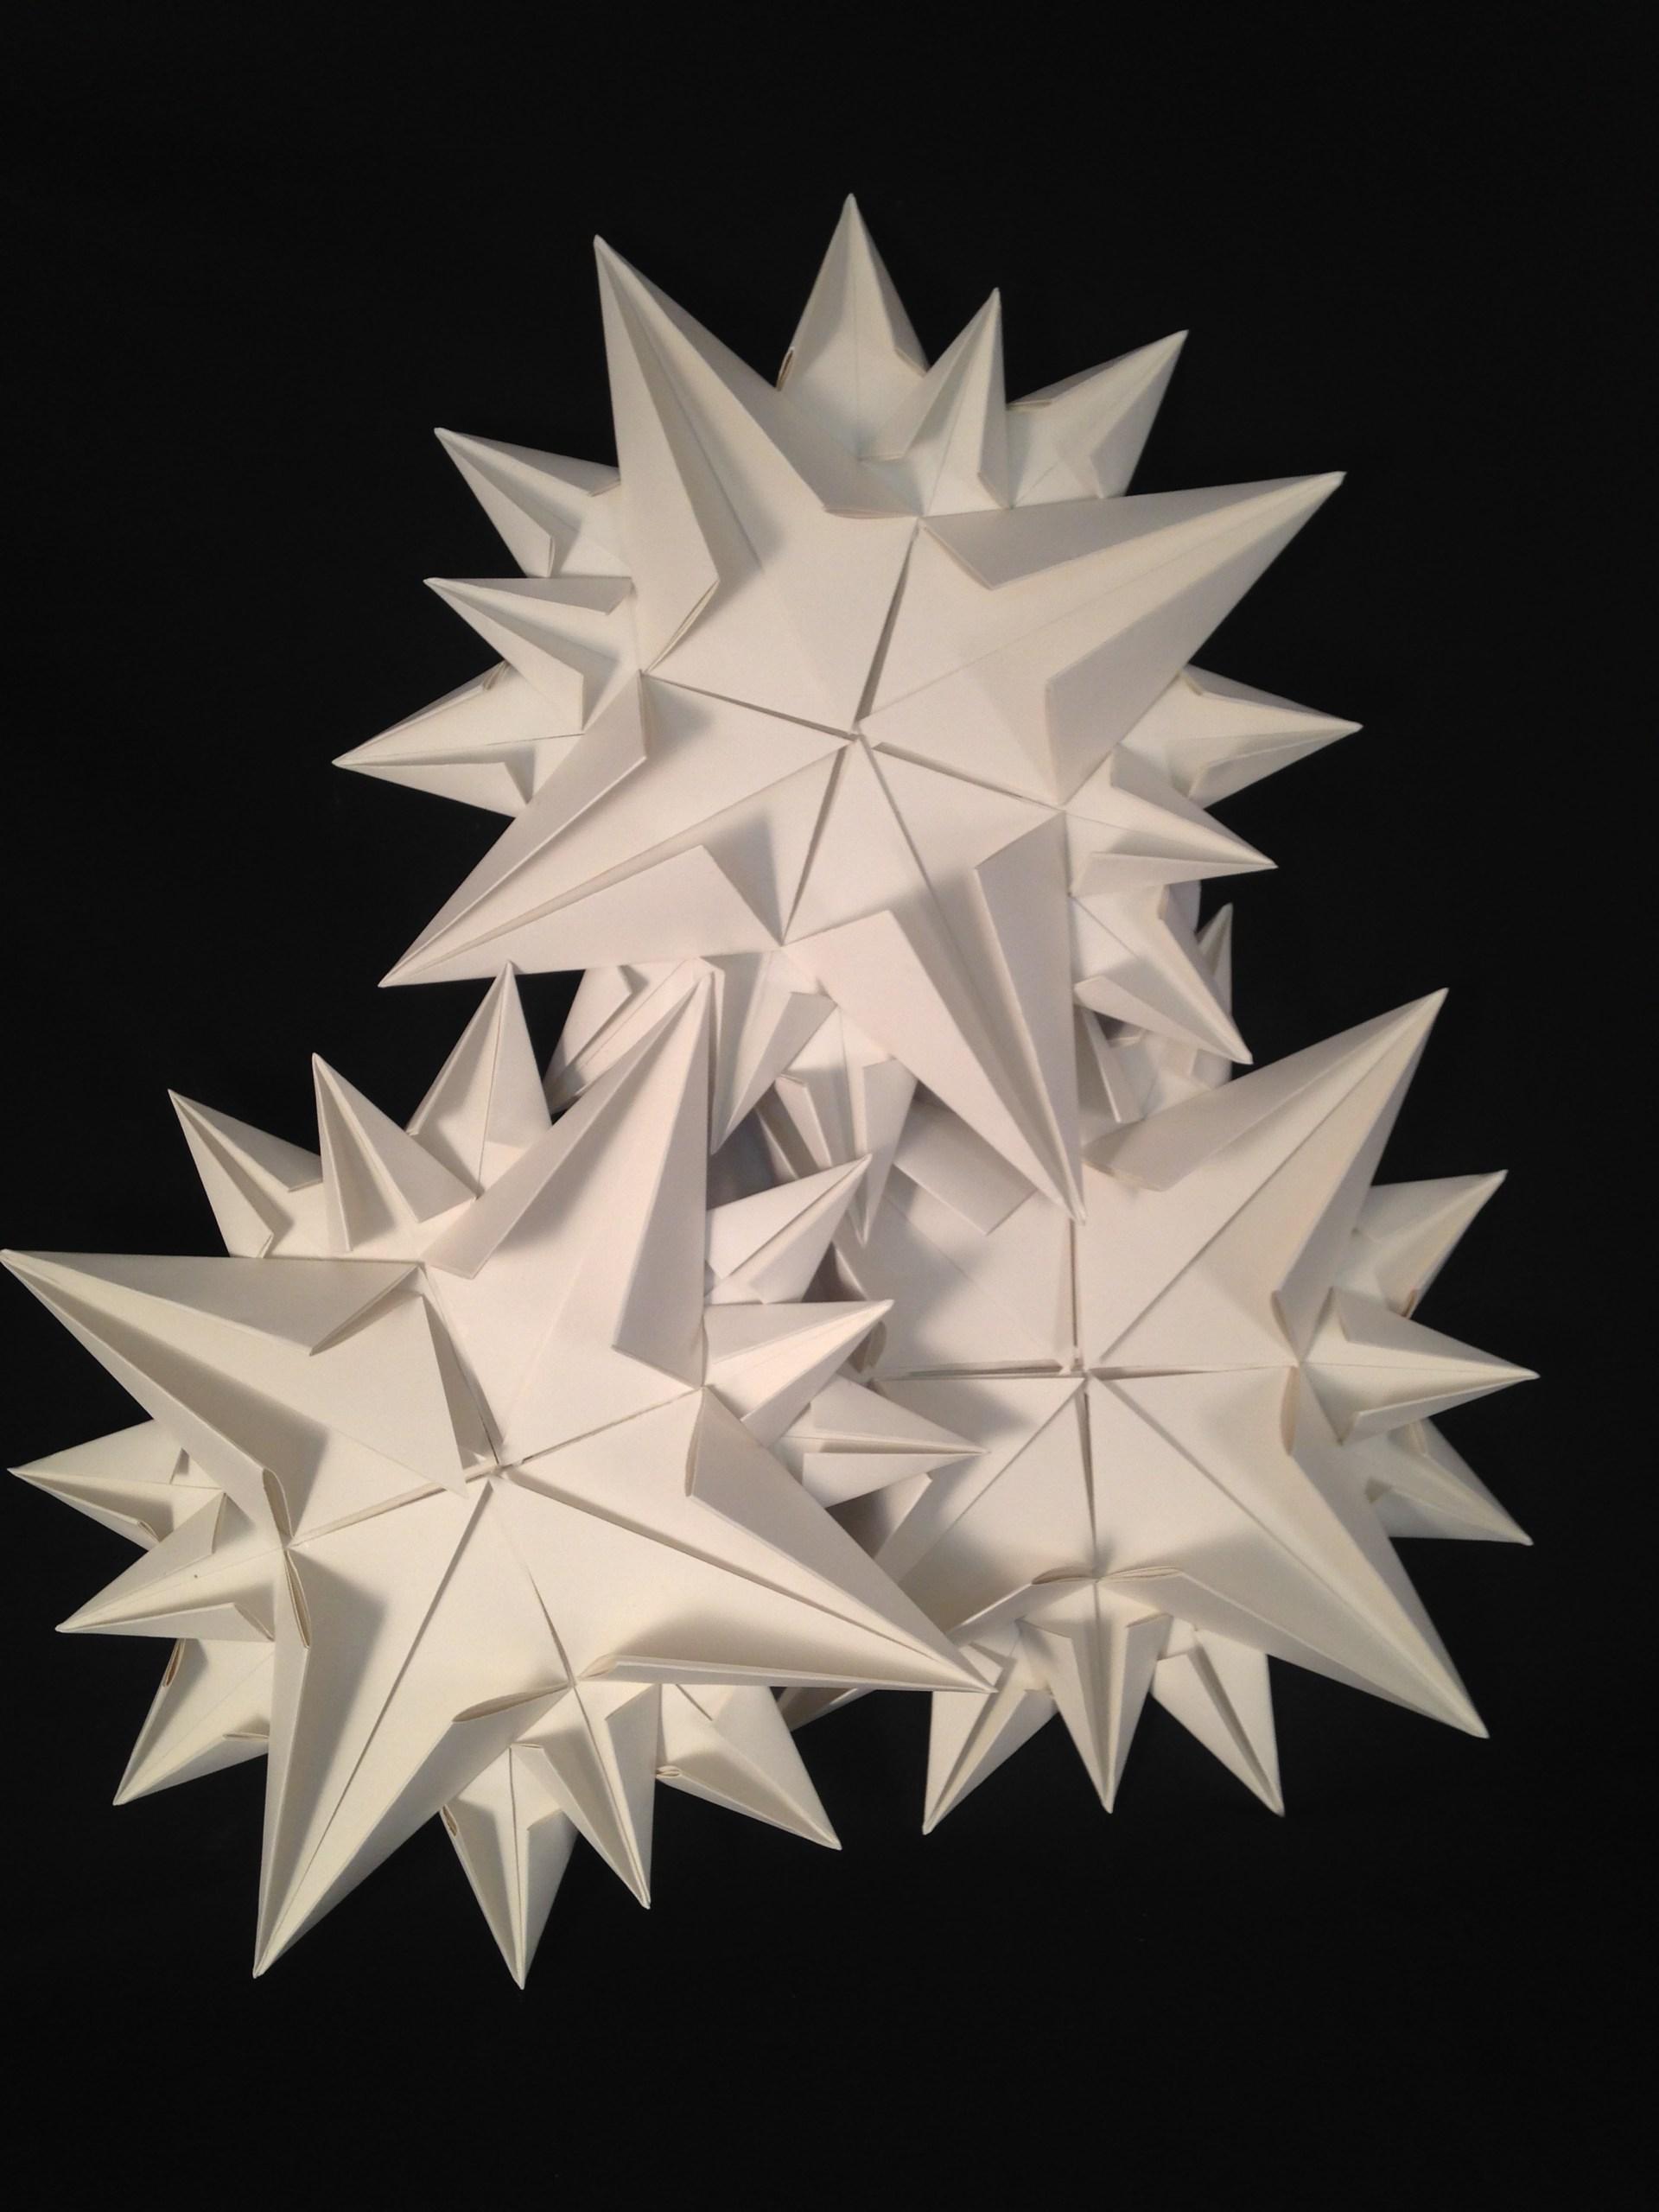 sculpture of white stars